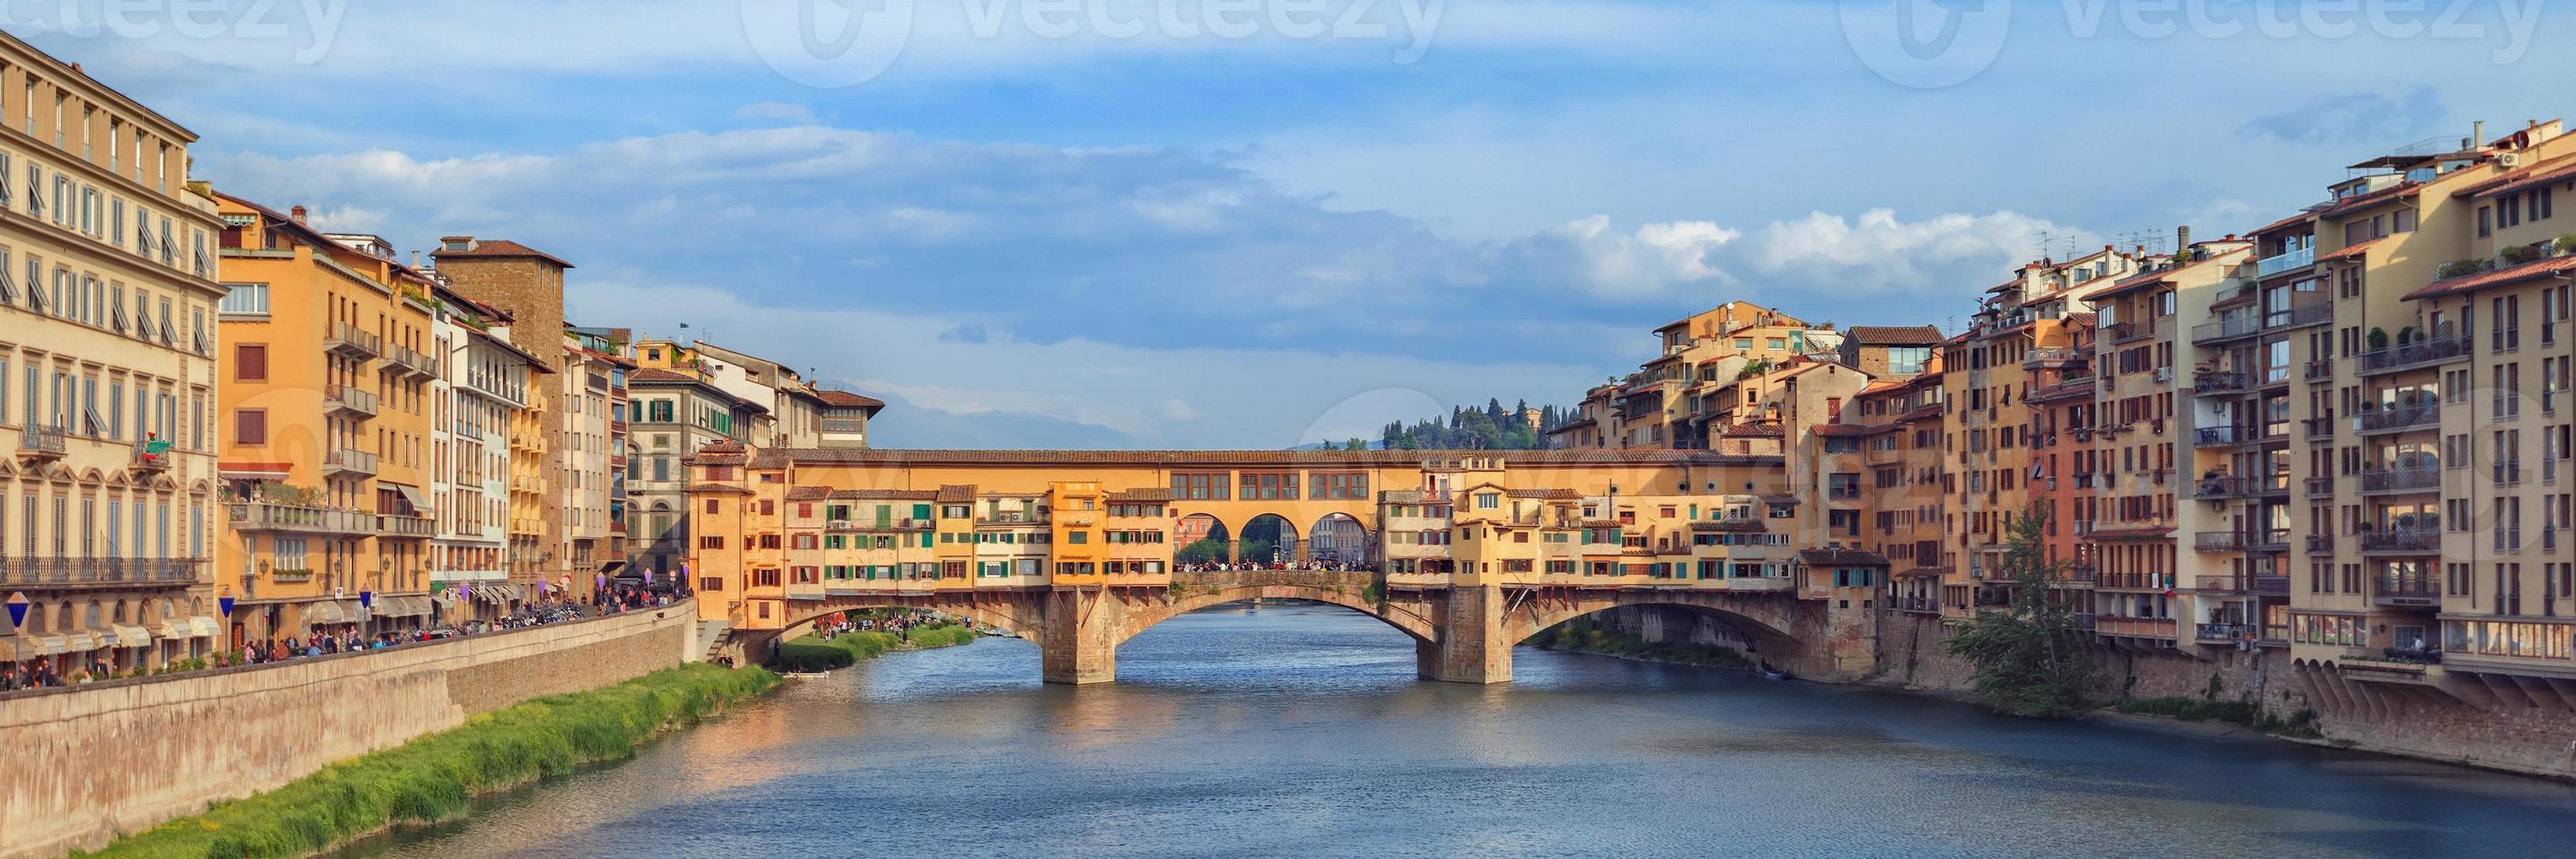 Famous bridge Ponte Vecchio, Florence, Italy photo